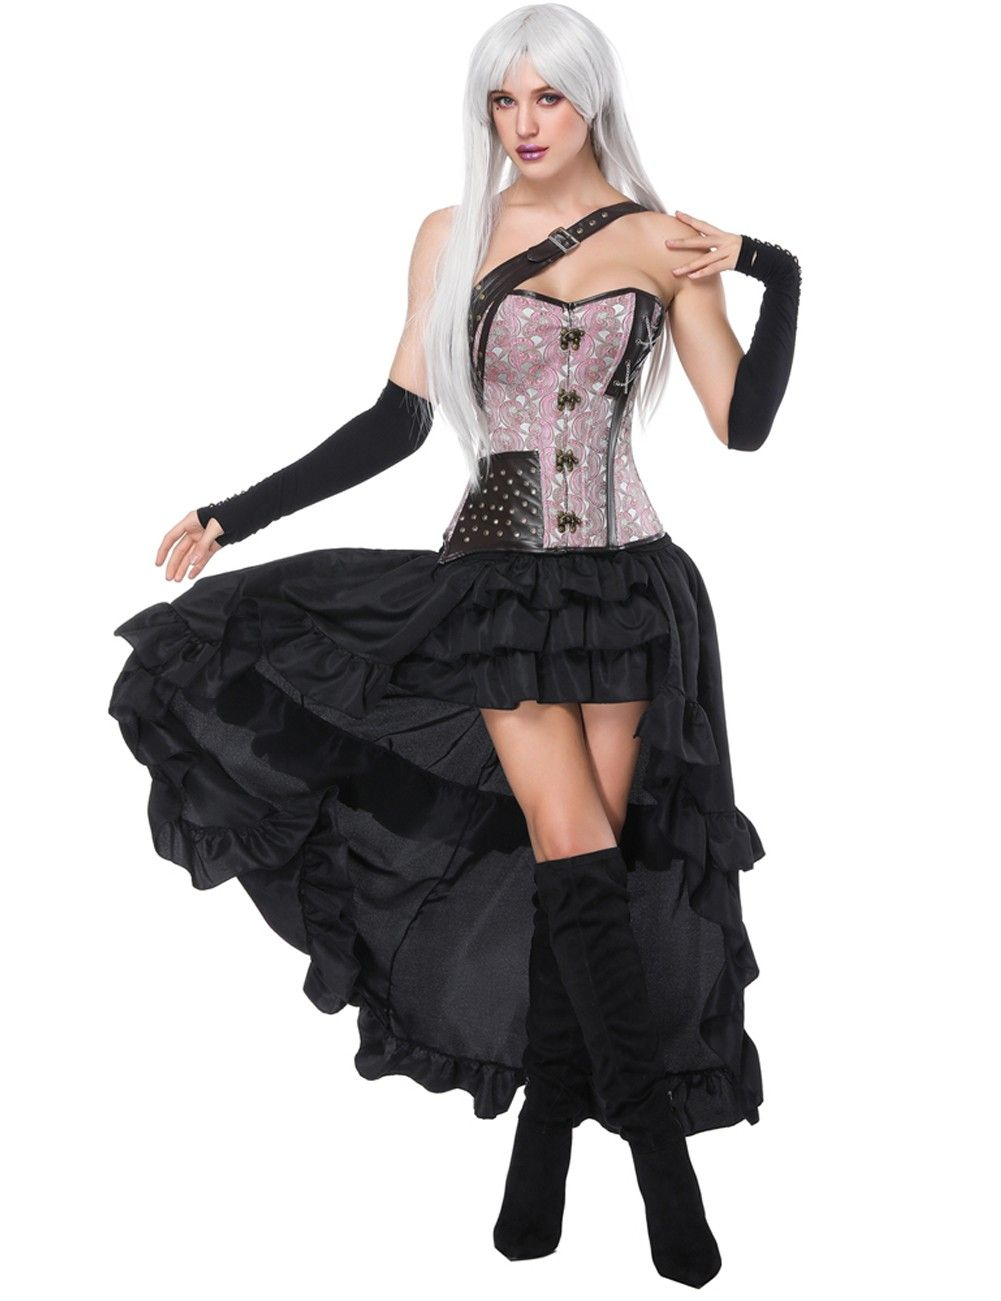 a39caa8612e Flat Out Light Pink Lace Up Corset Skirt Set Chain Cross One Strap ...